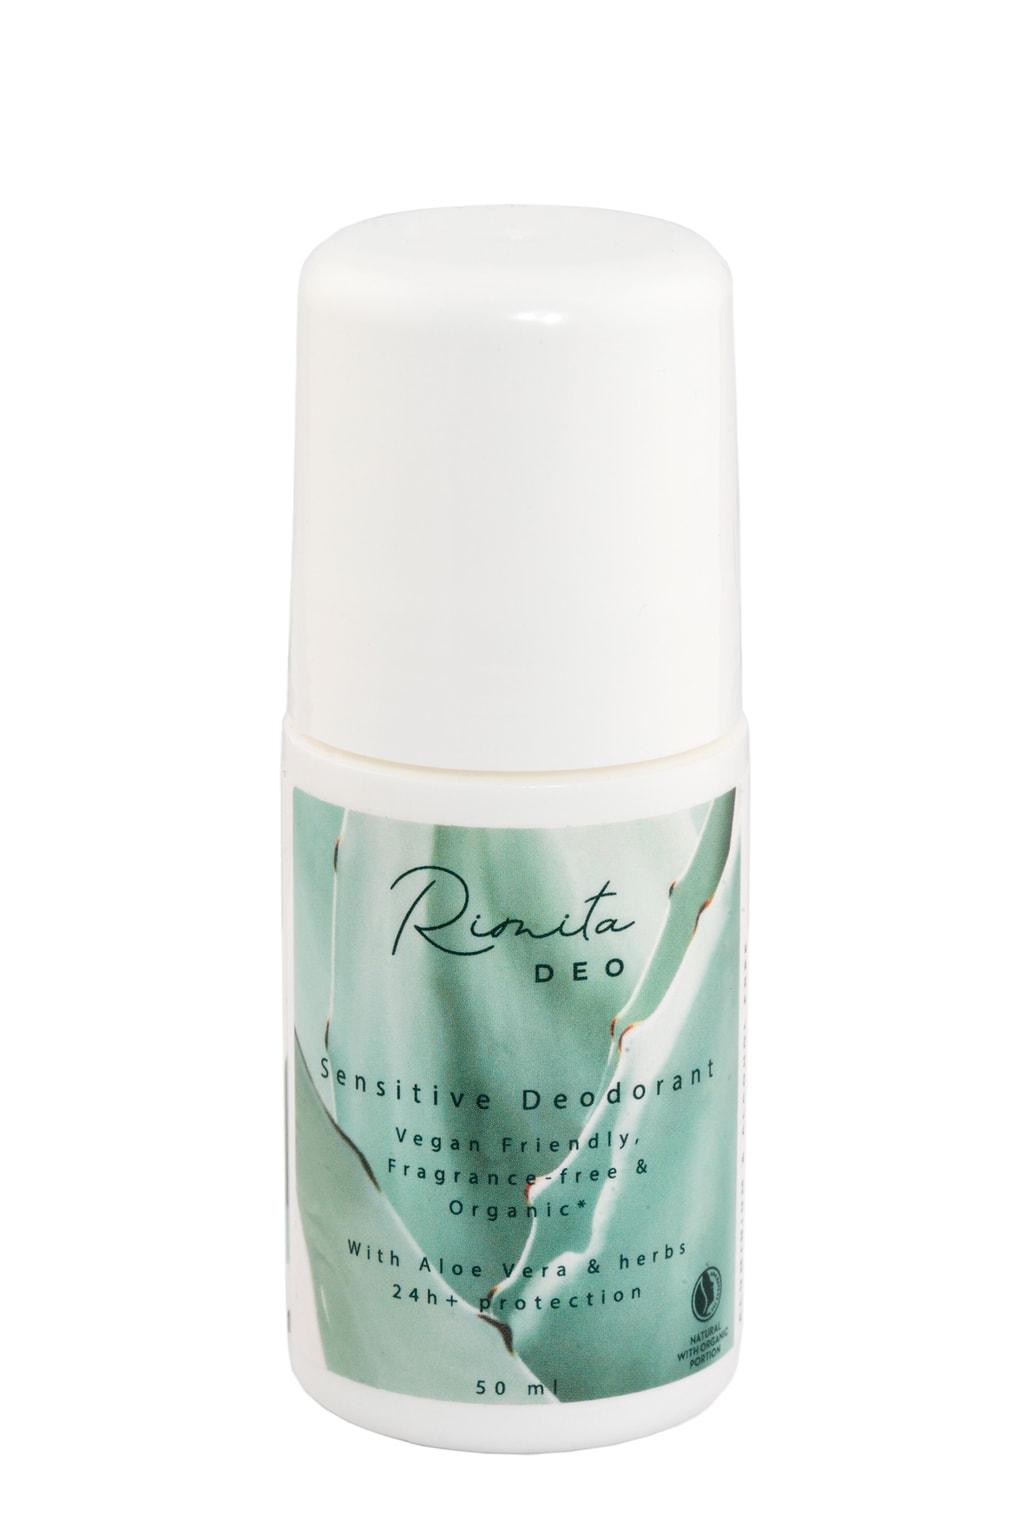 Rimita Green Sensitive deodorantti